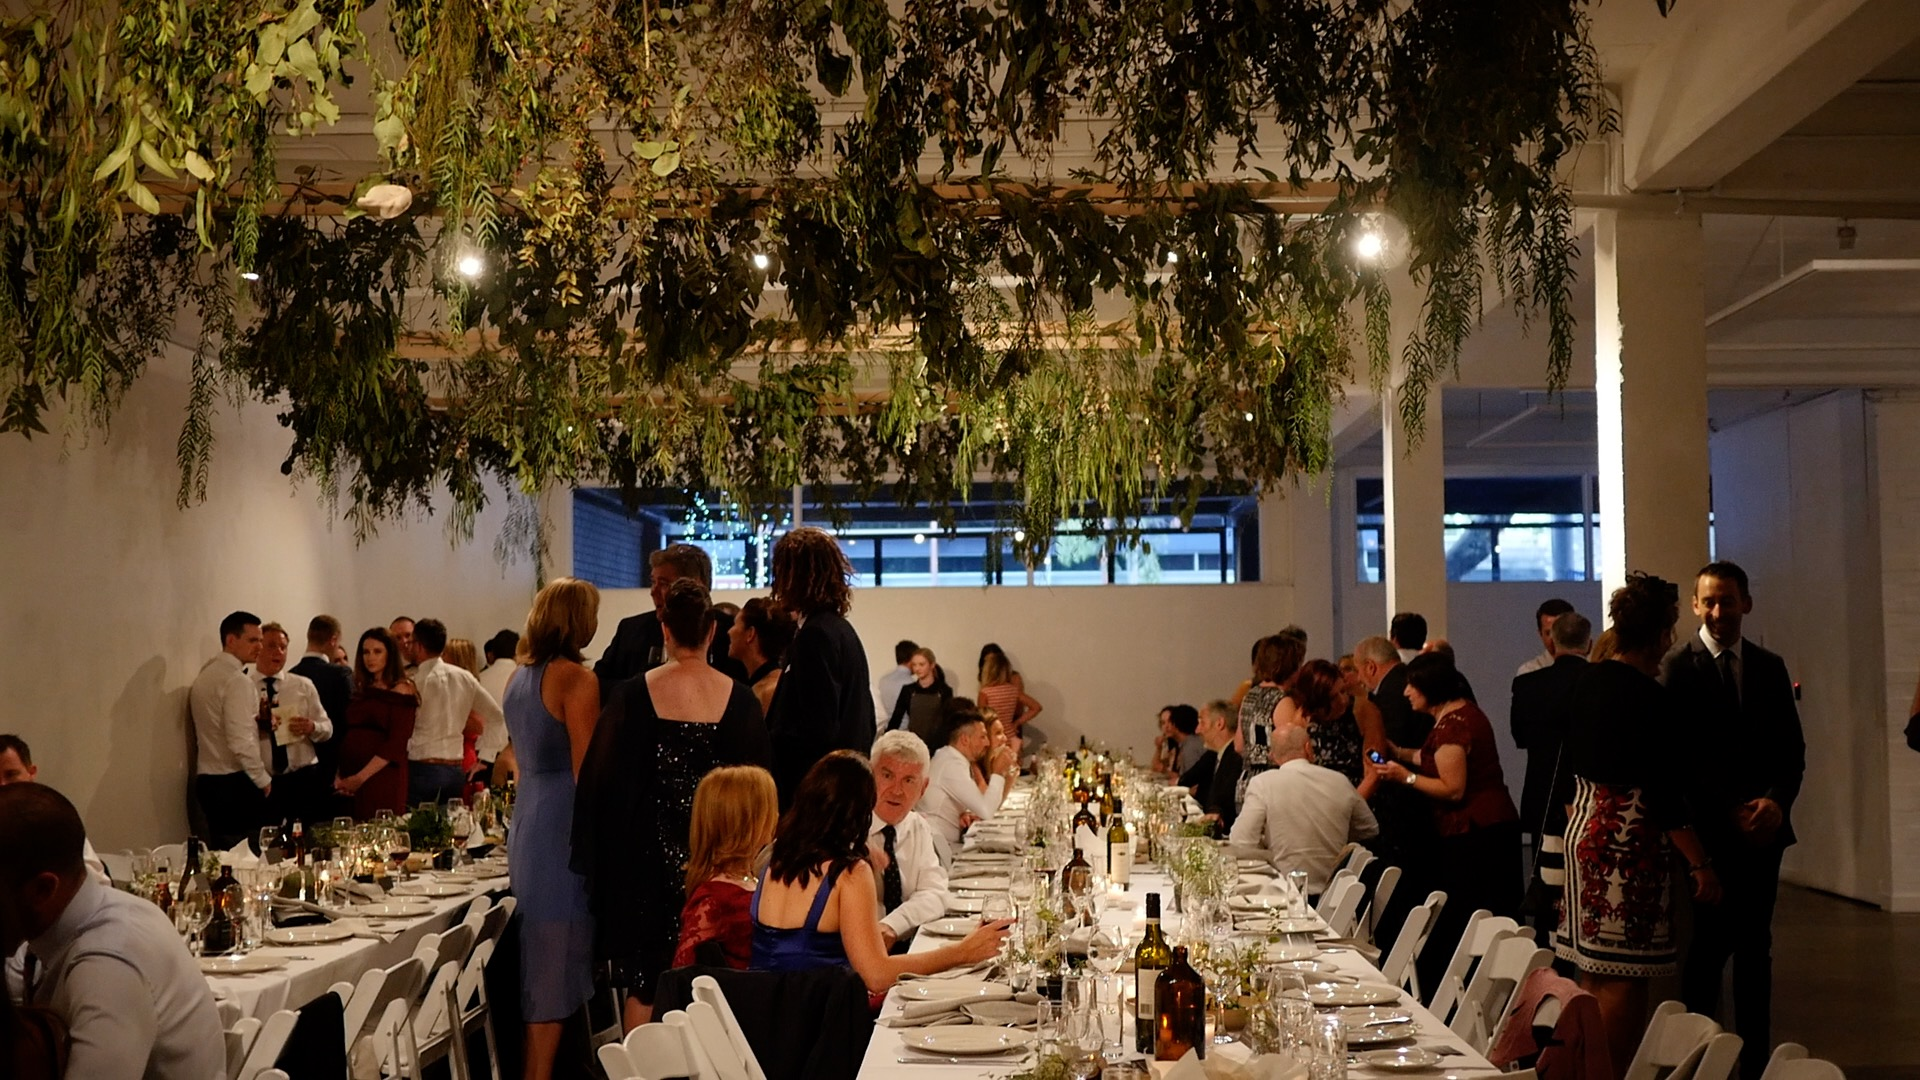 524 Flinders street event space. (killer venue btw)